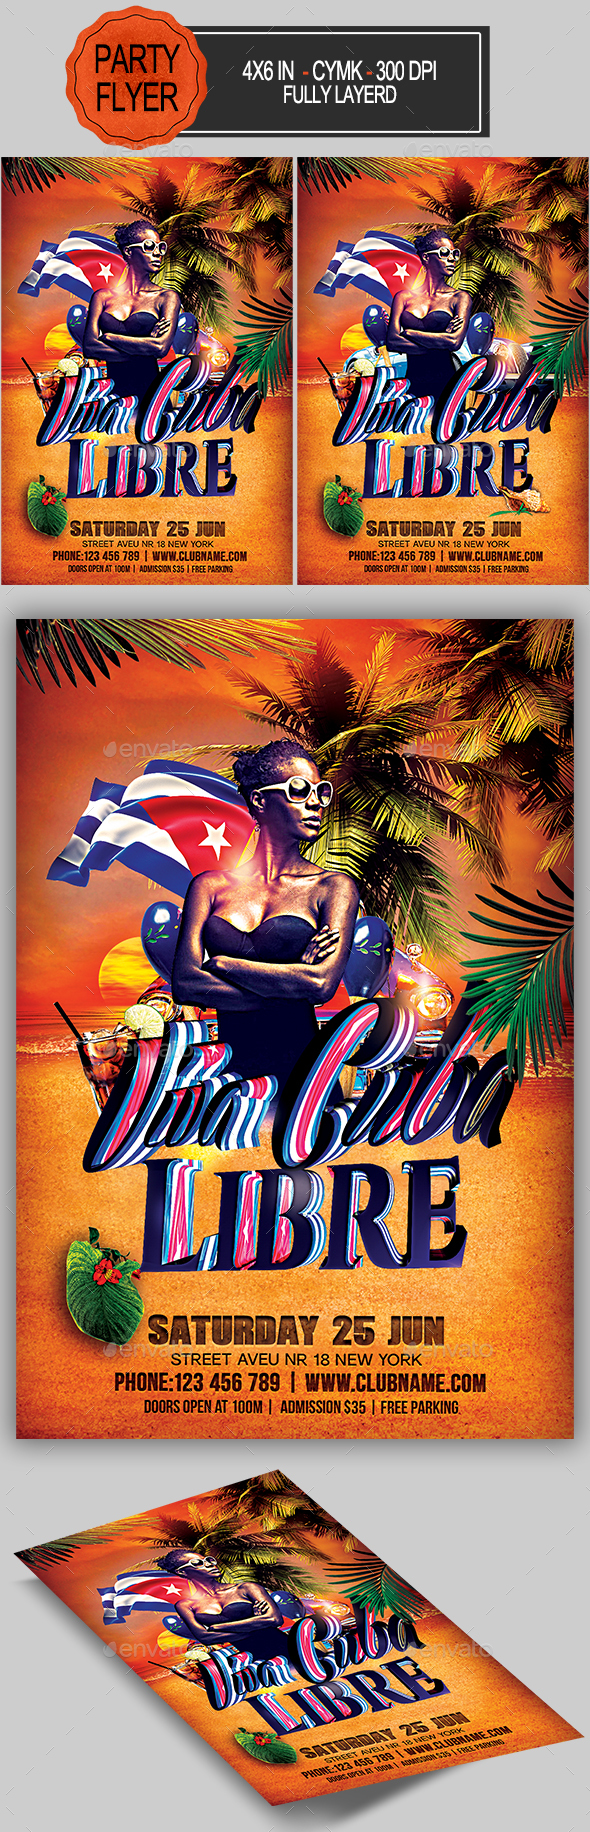 Graphicriver Viva Cuba Libre Flyer 19476317